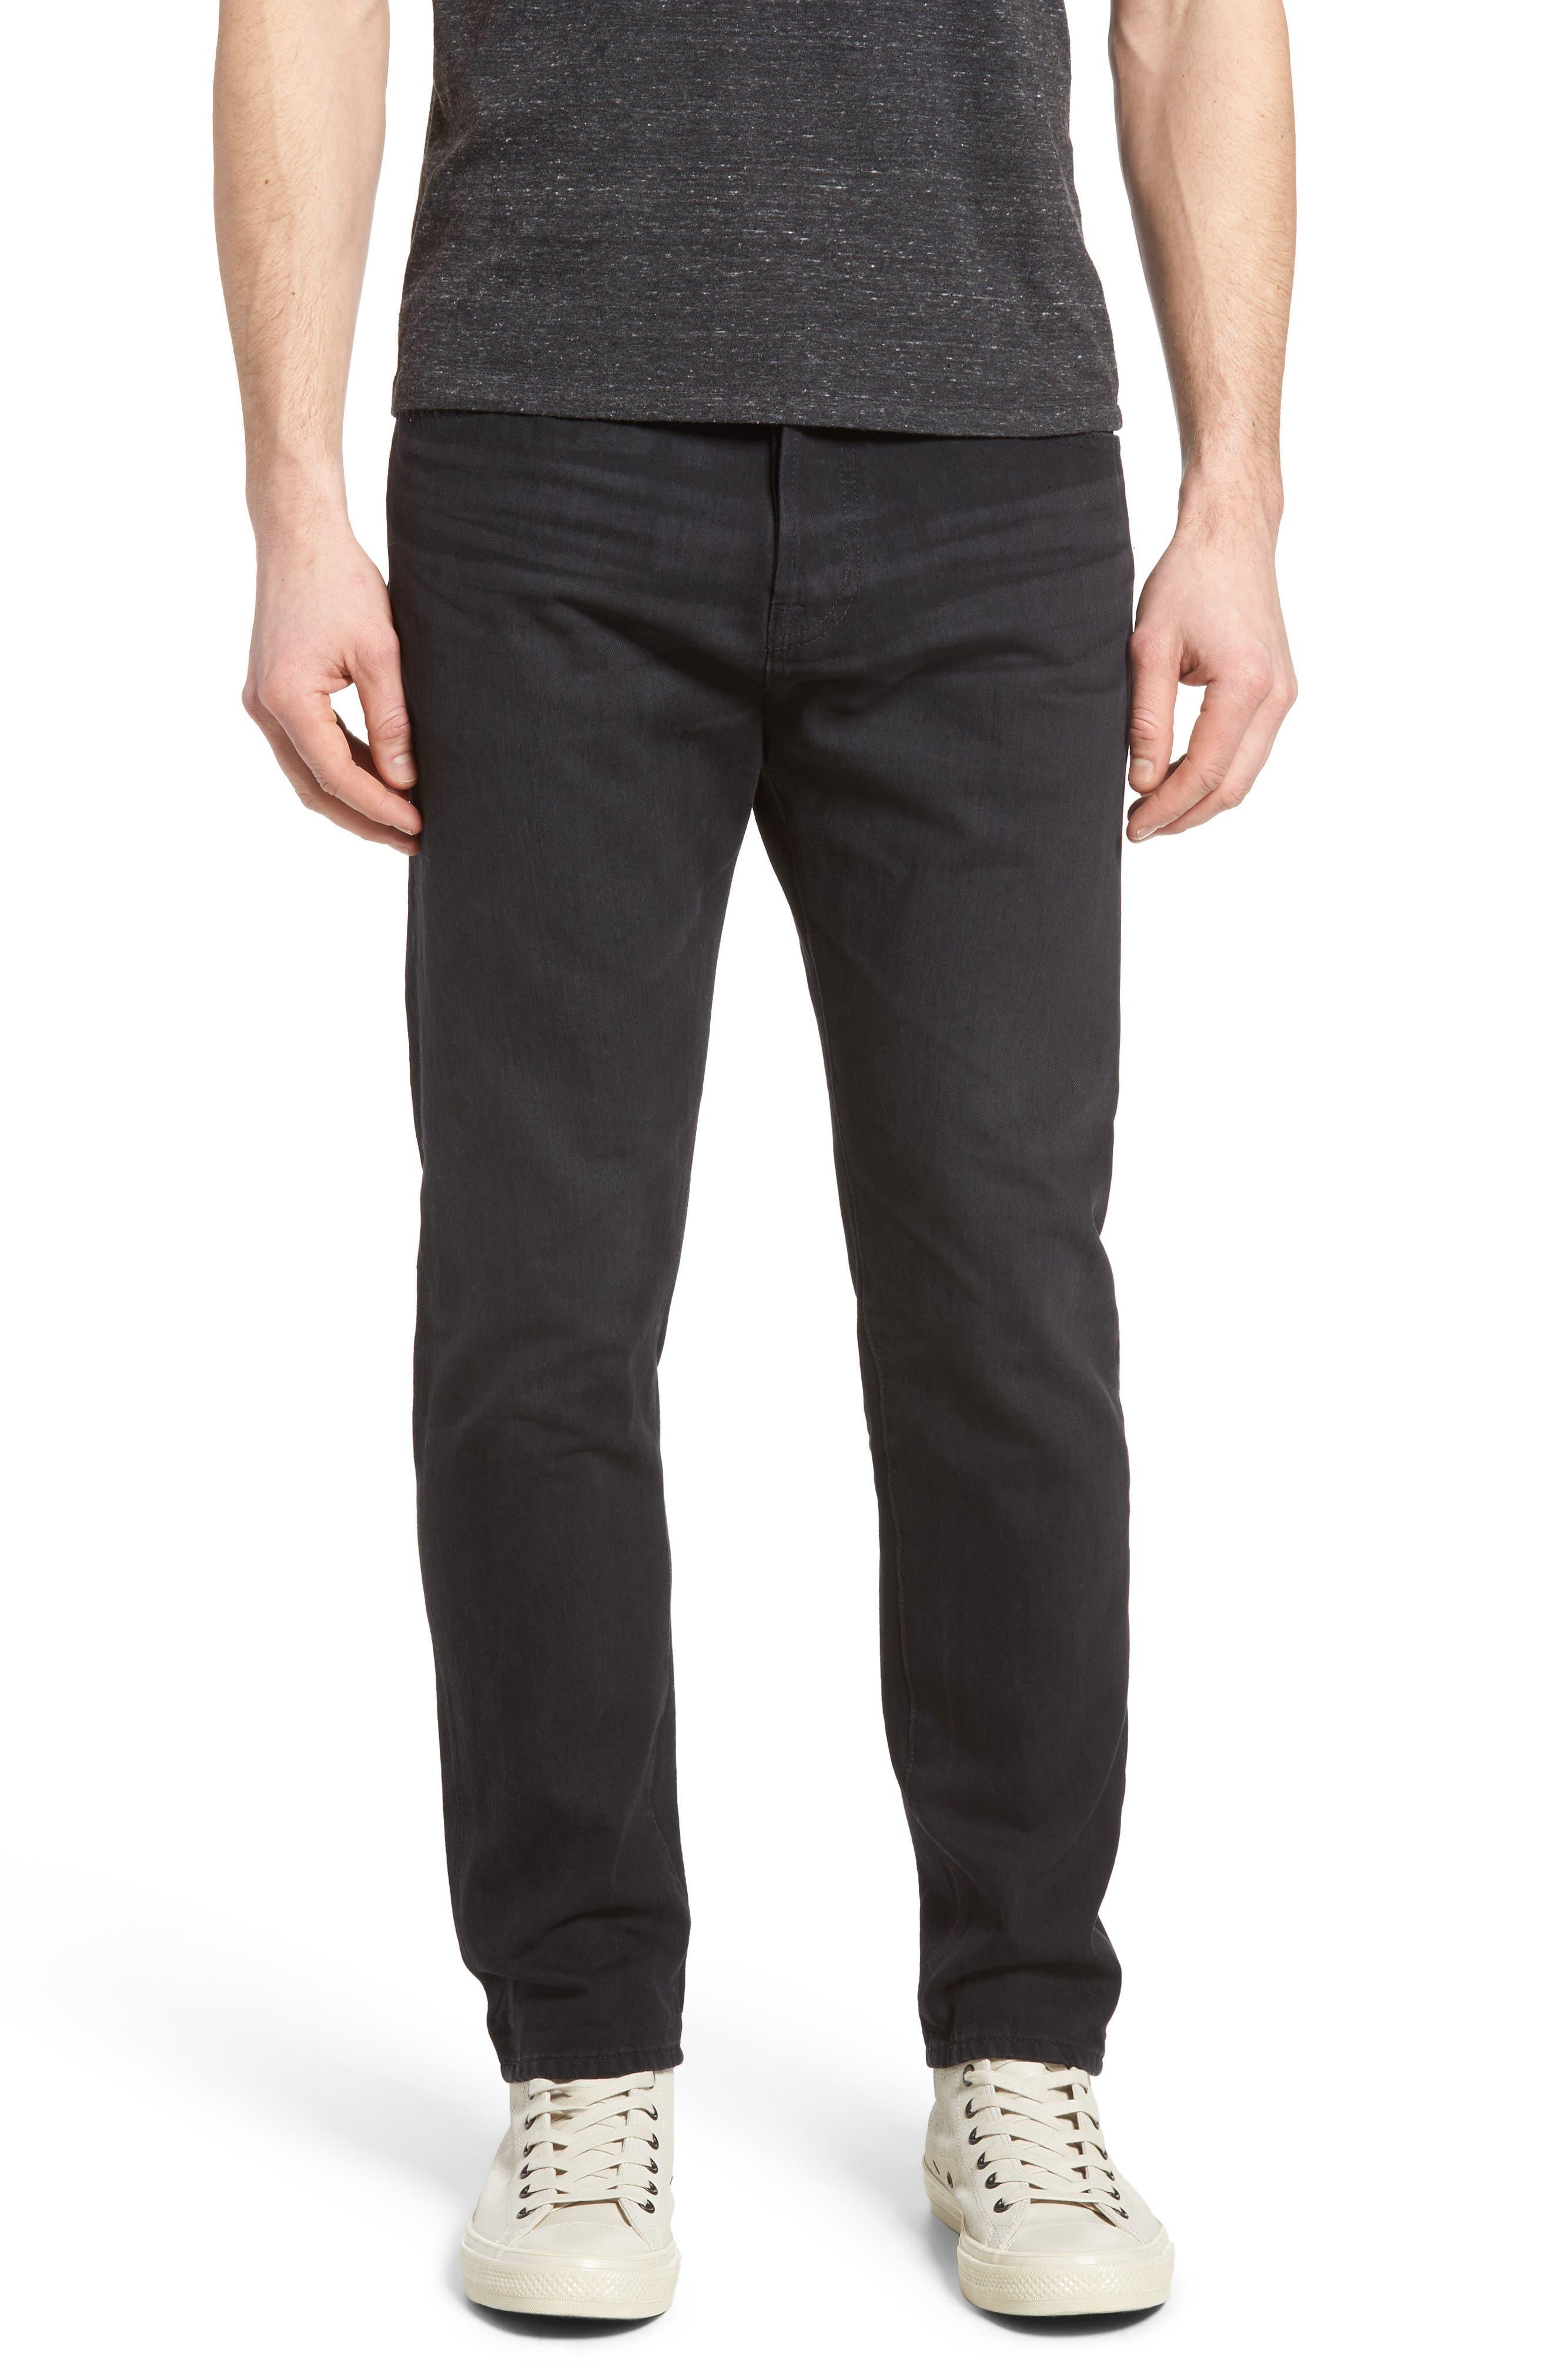 Apex Slouchy Slim Fit Jeans,                             Main thumbnail 1, color,